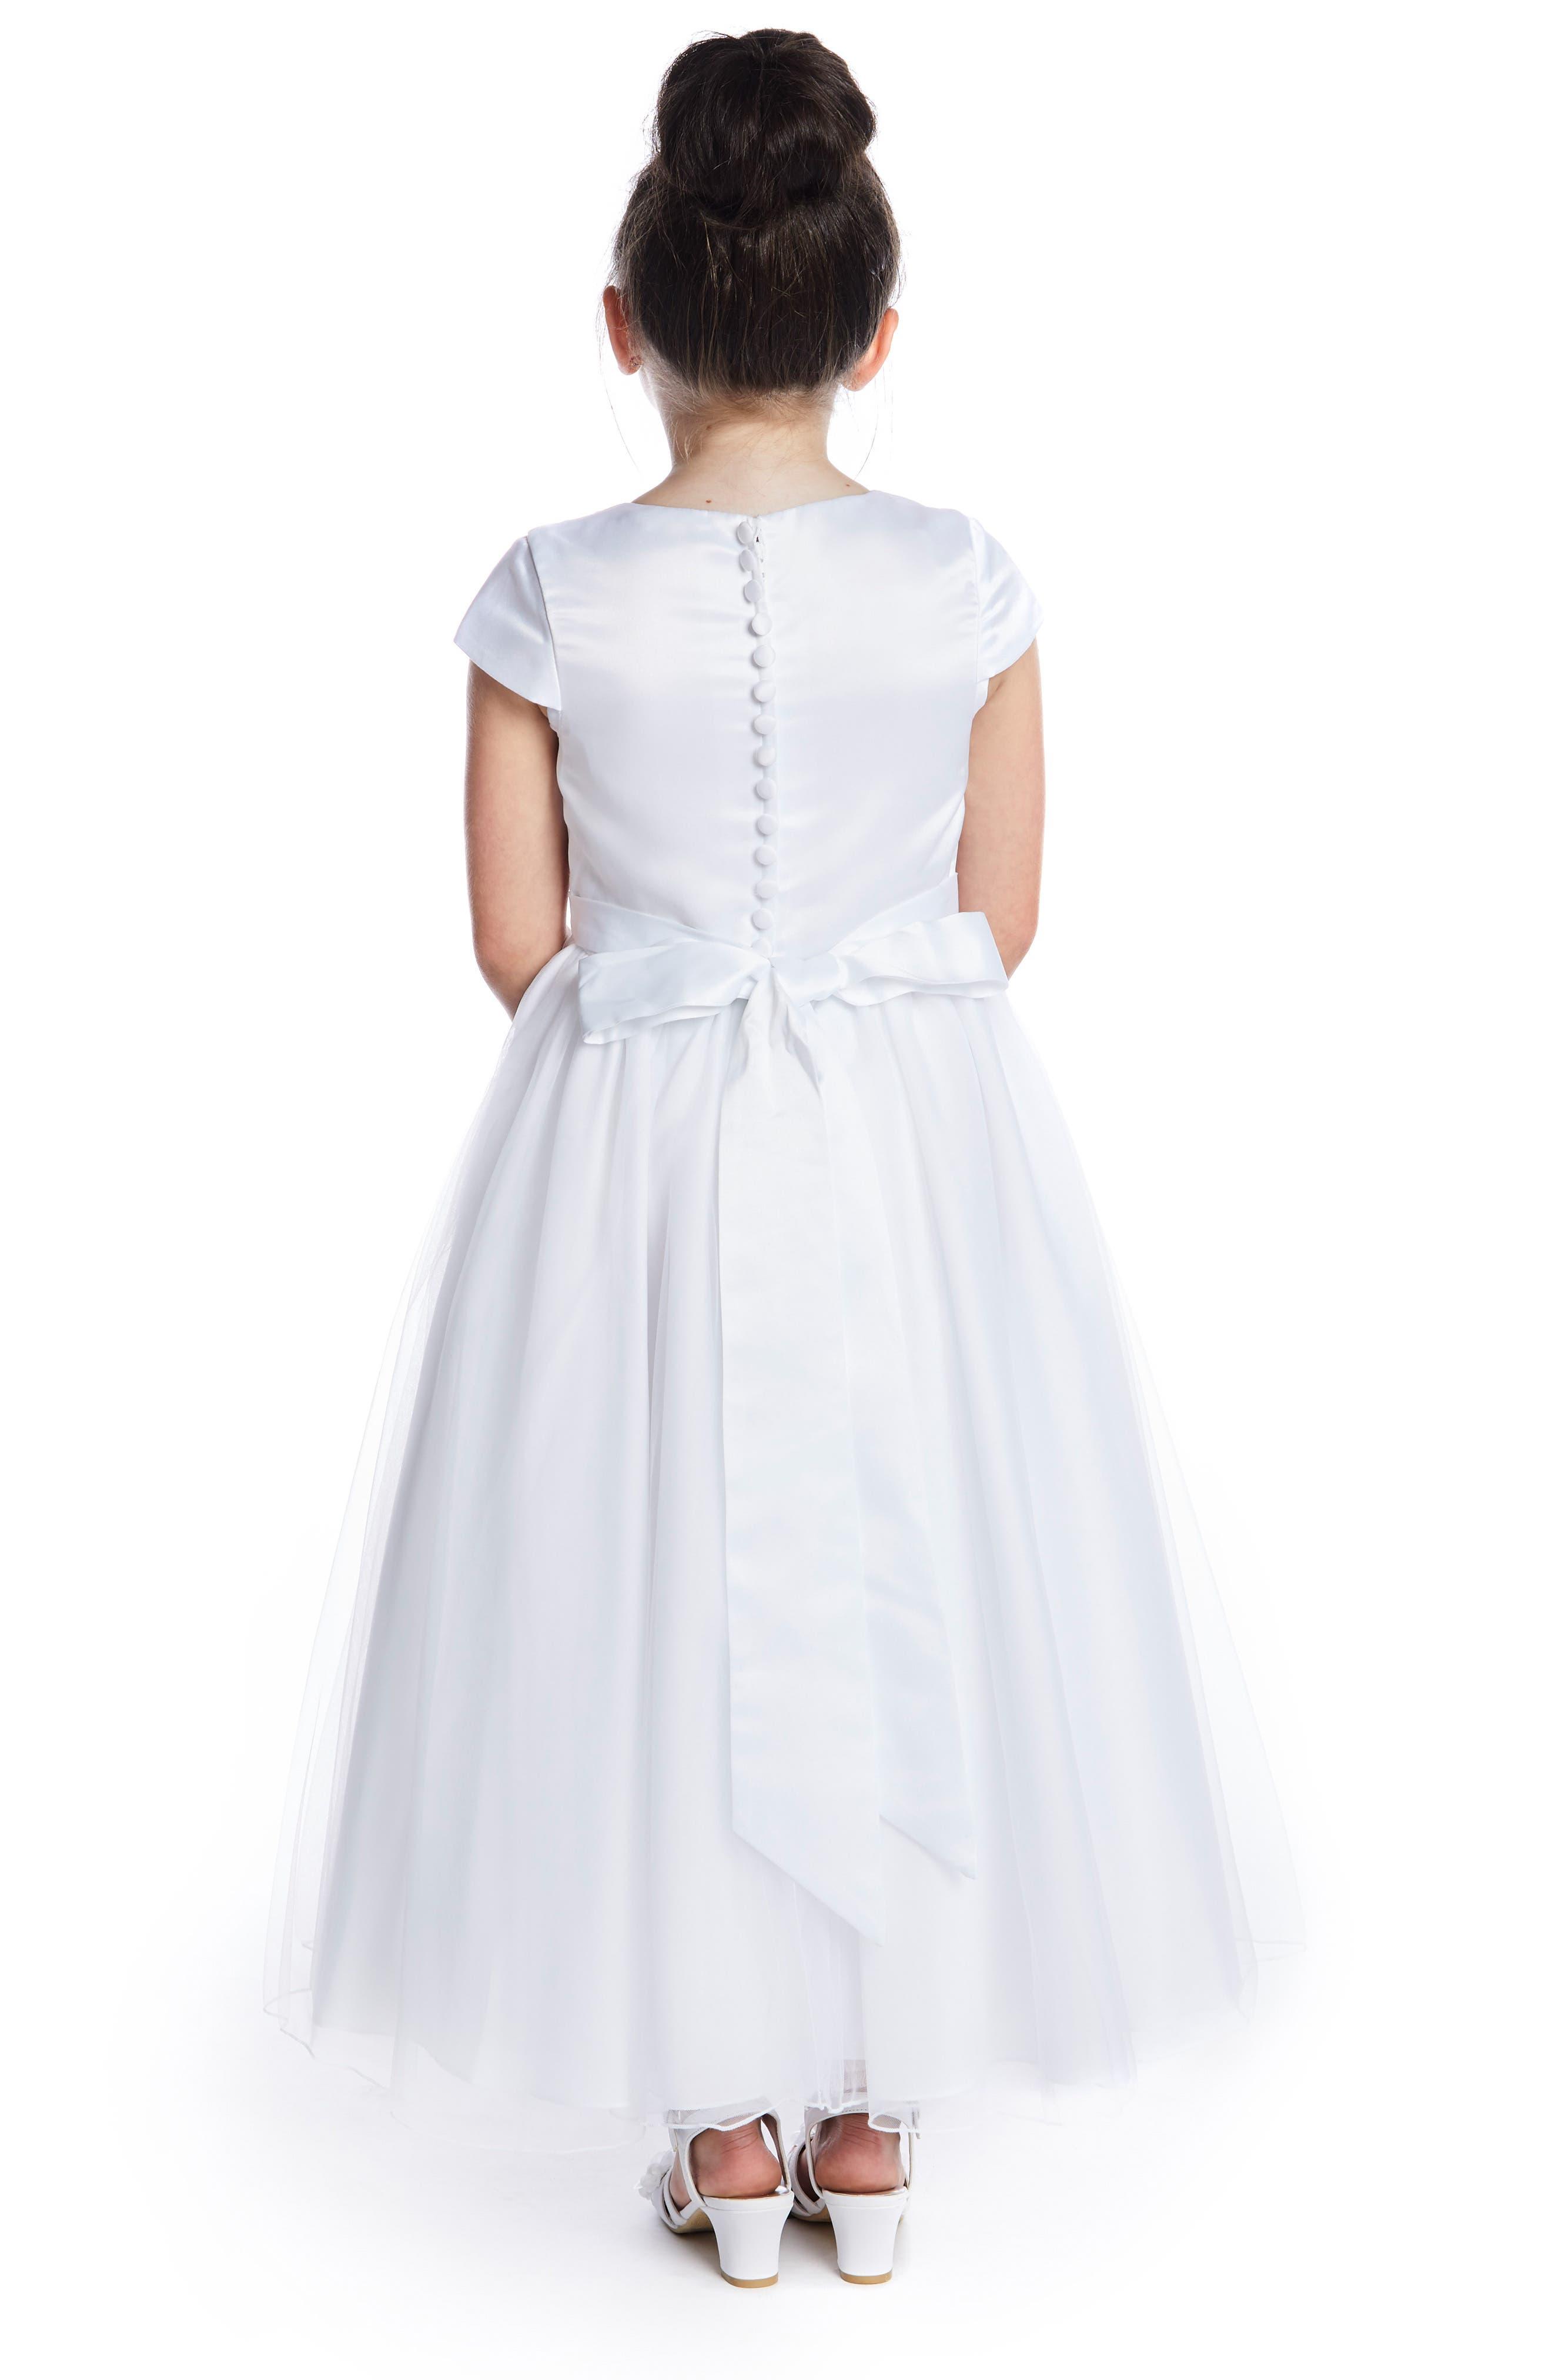 LAUREN MARIE,                             Beaded Lace First Communion Dress,                             Alternate thumbnail 3, color,                             WHITE